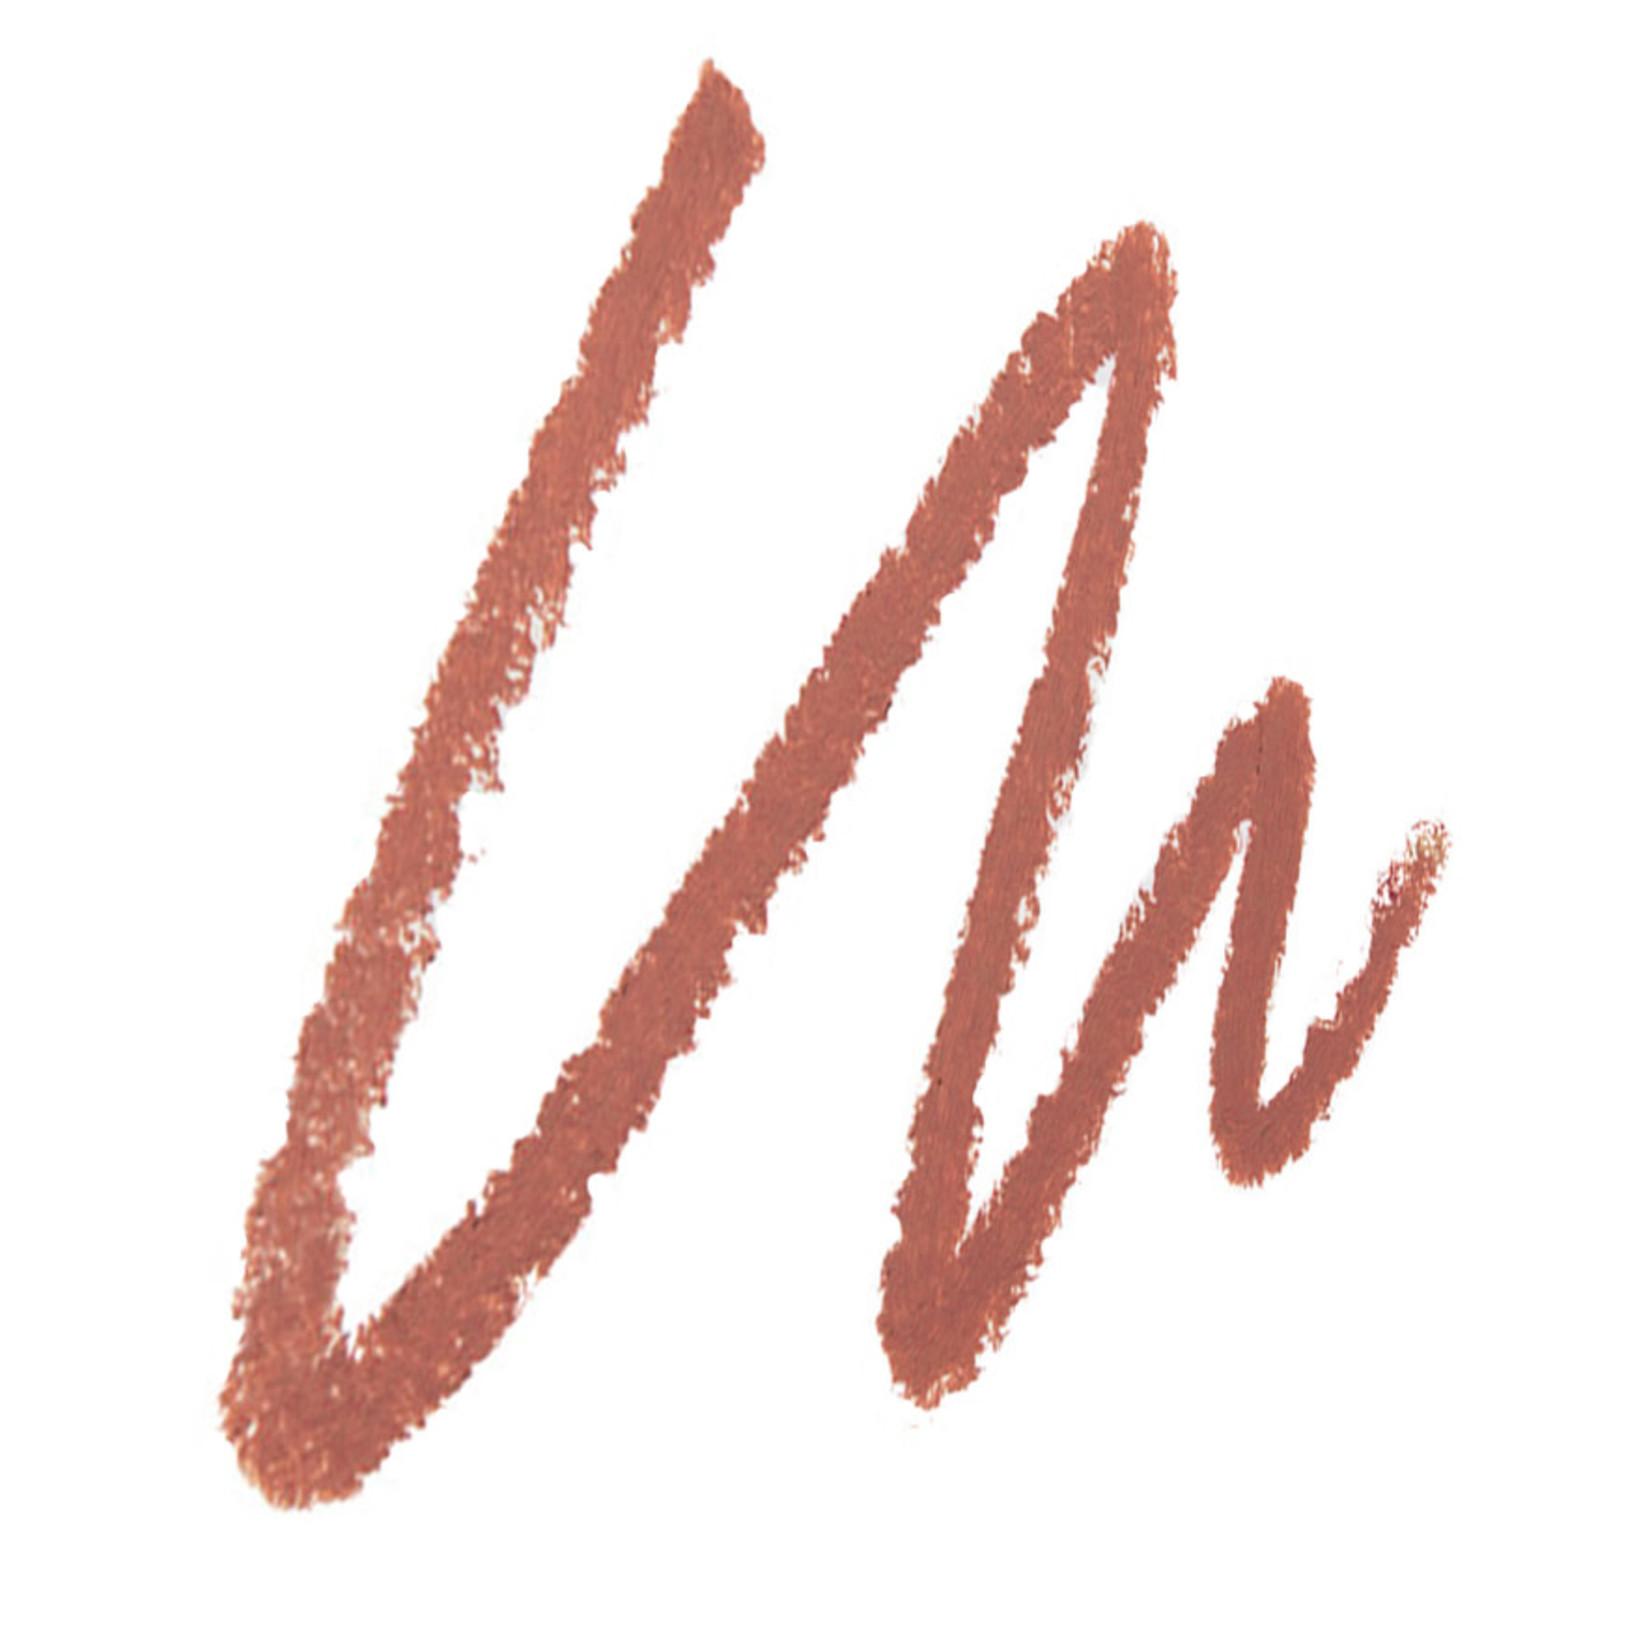 ELATE COSMETICS EYECOLOUR PENCIL - MERIT